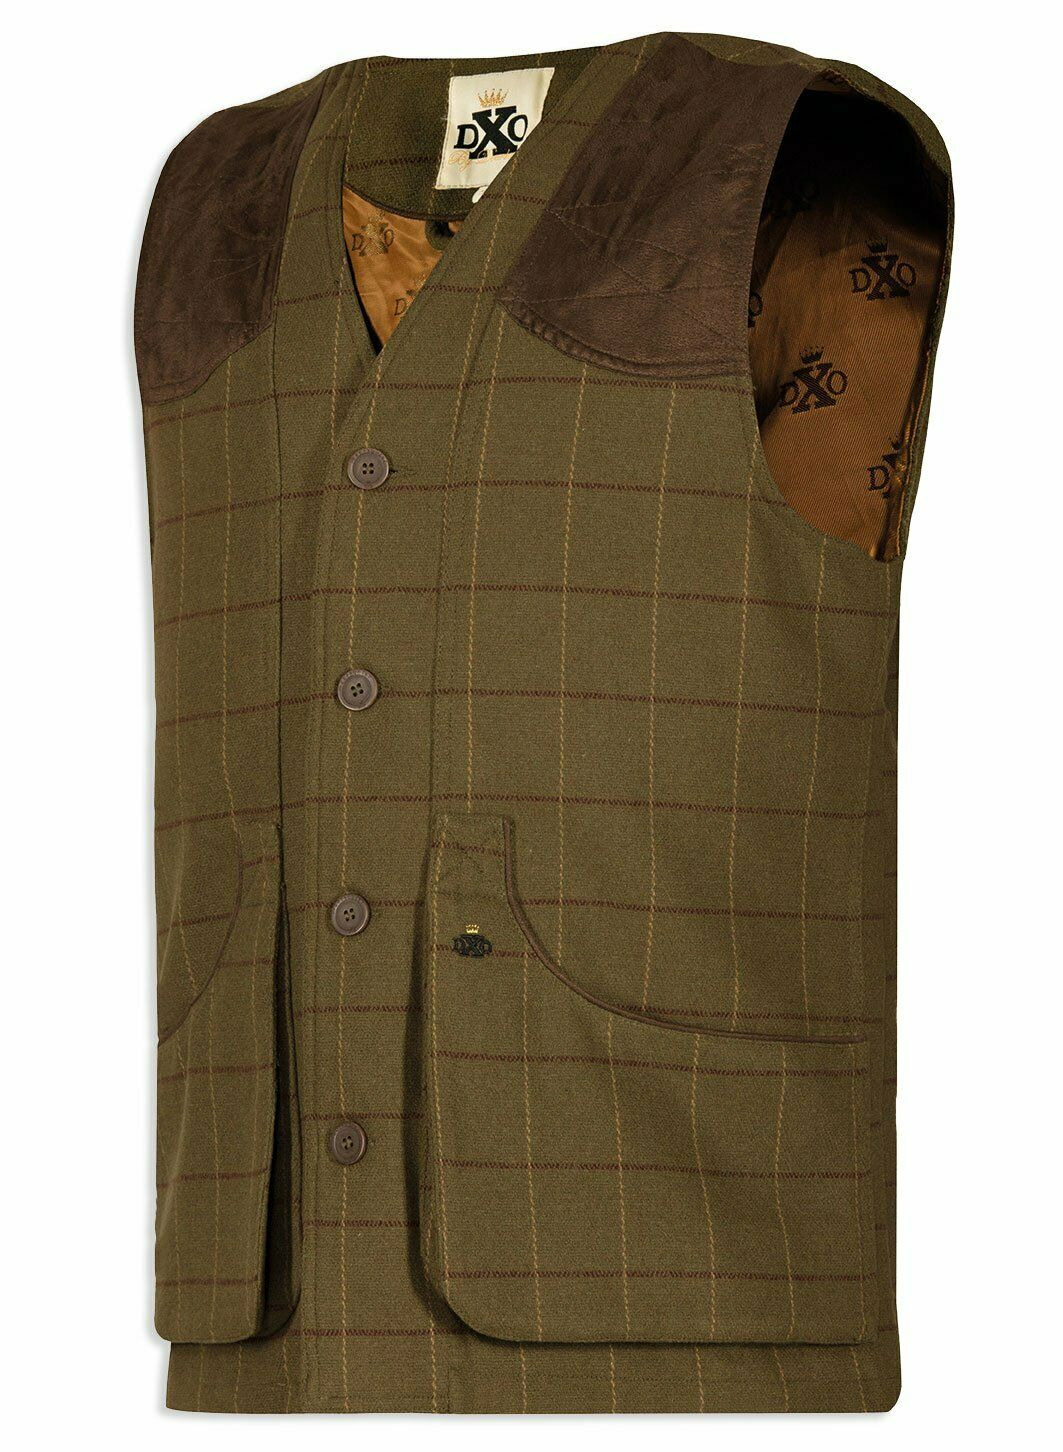 Deerhunter Woodland Waistcoat Mosstone Tweed Gilet Hunting Shooting